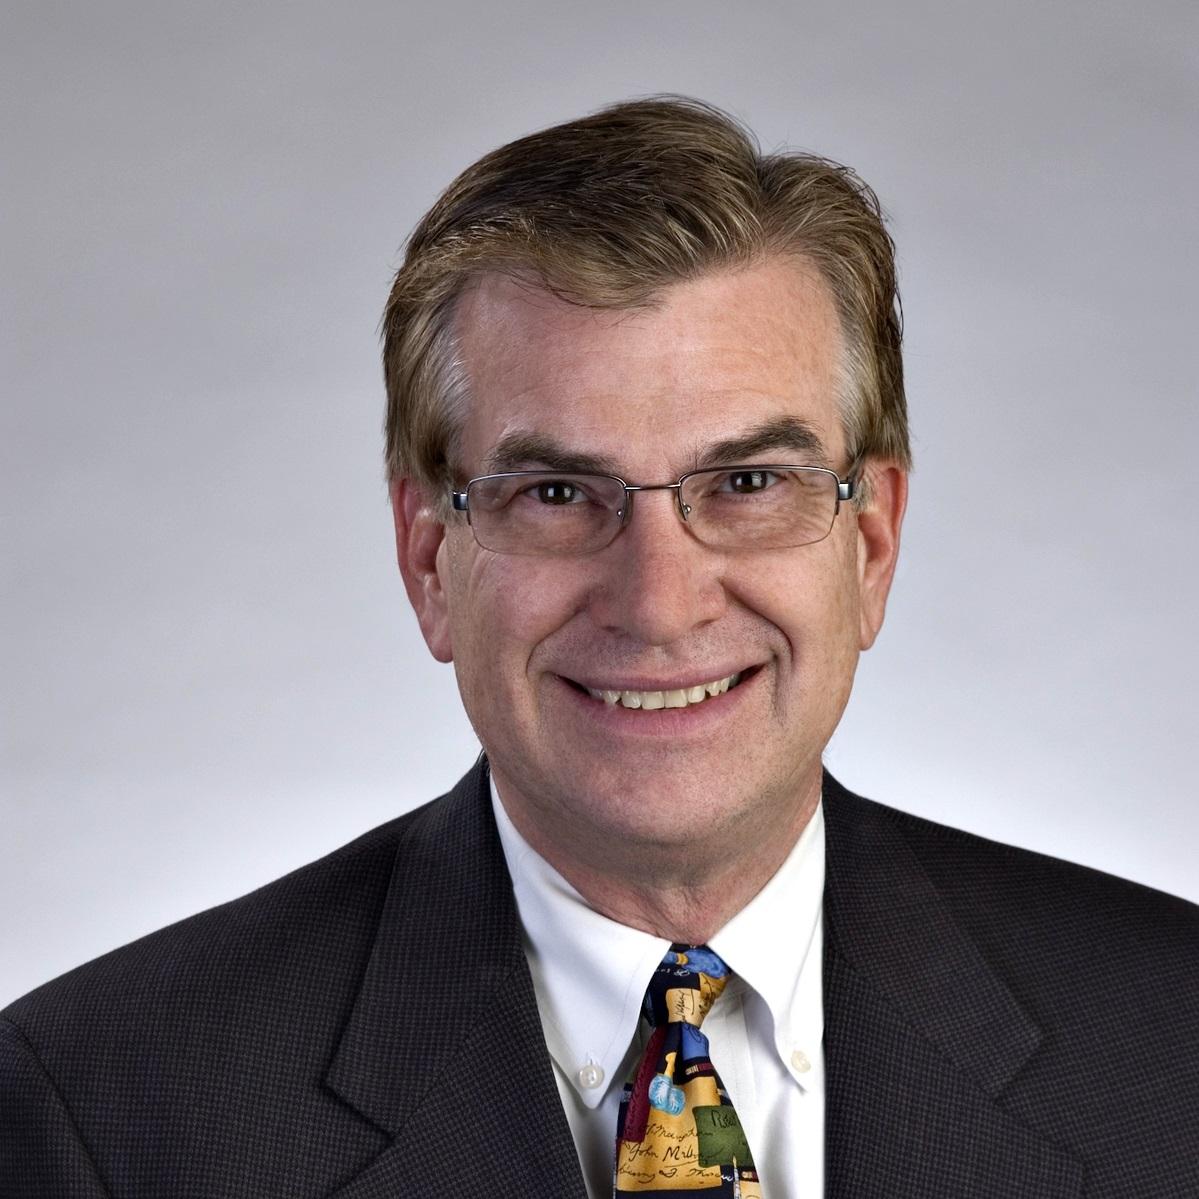 Harold C. Dorenbecher